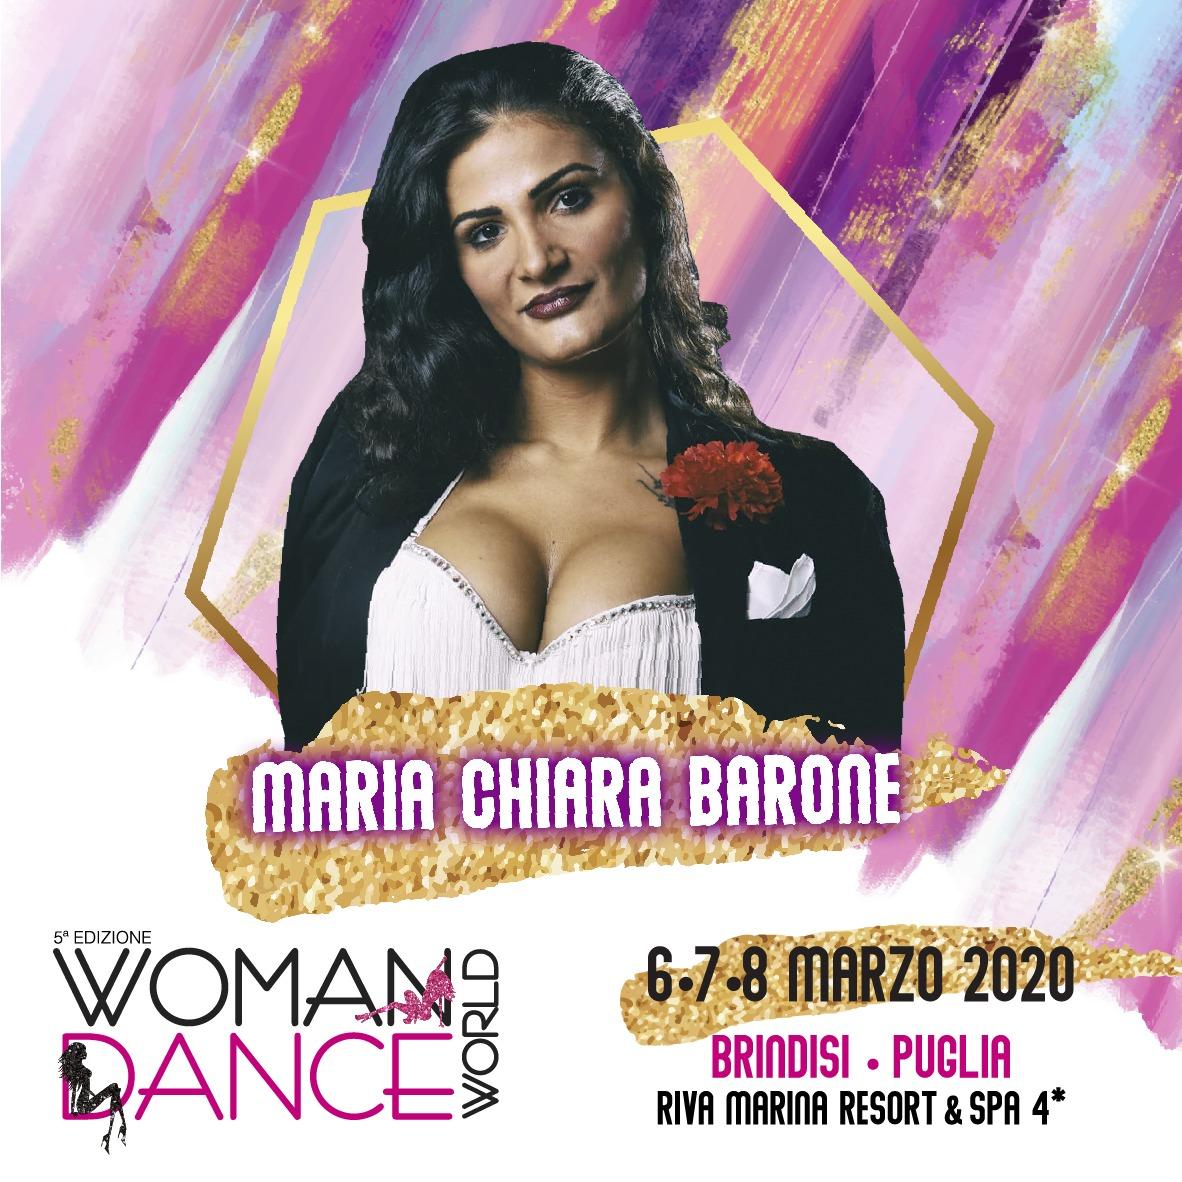 Maria Chiara Barone